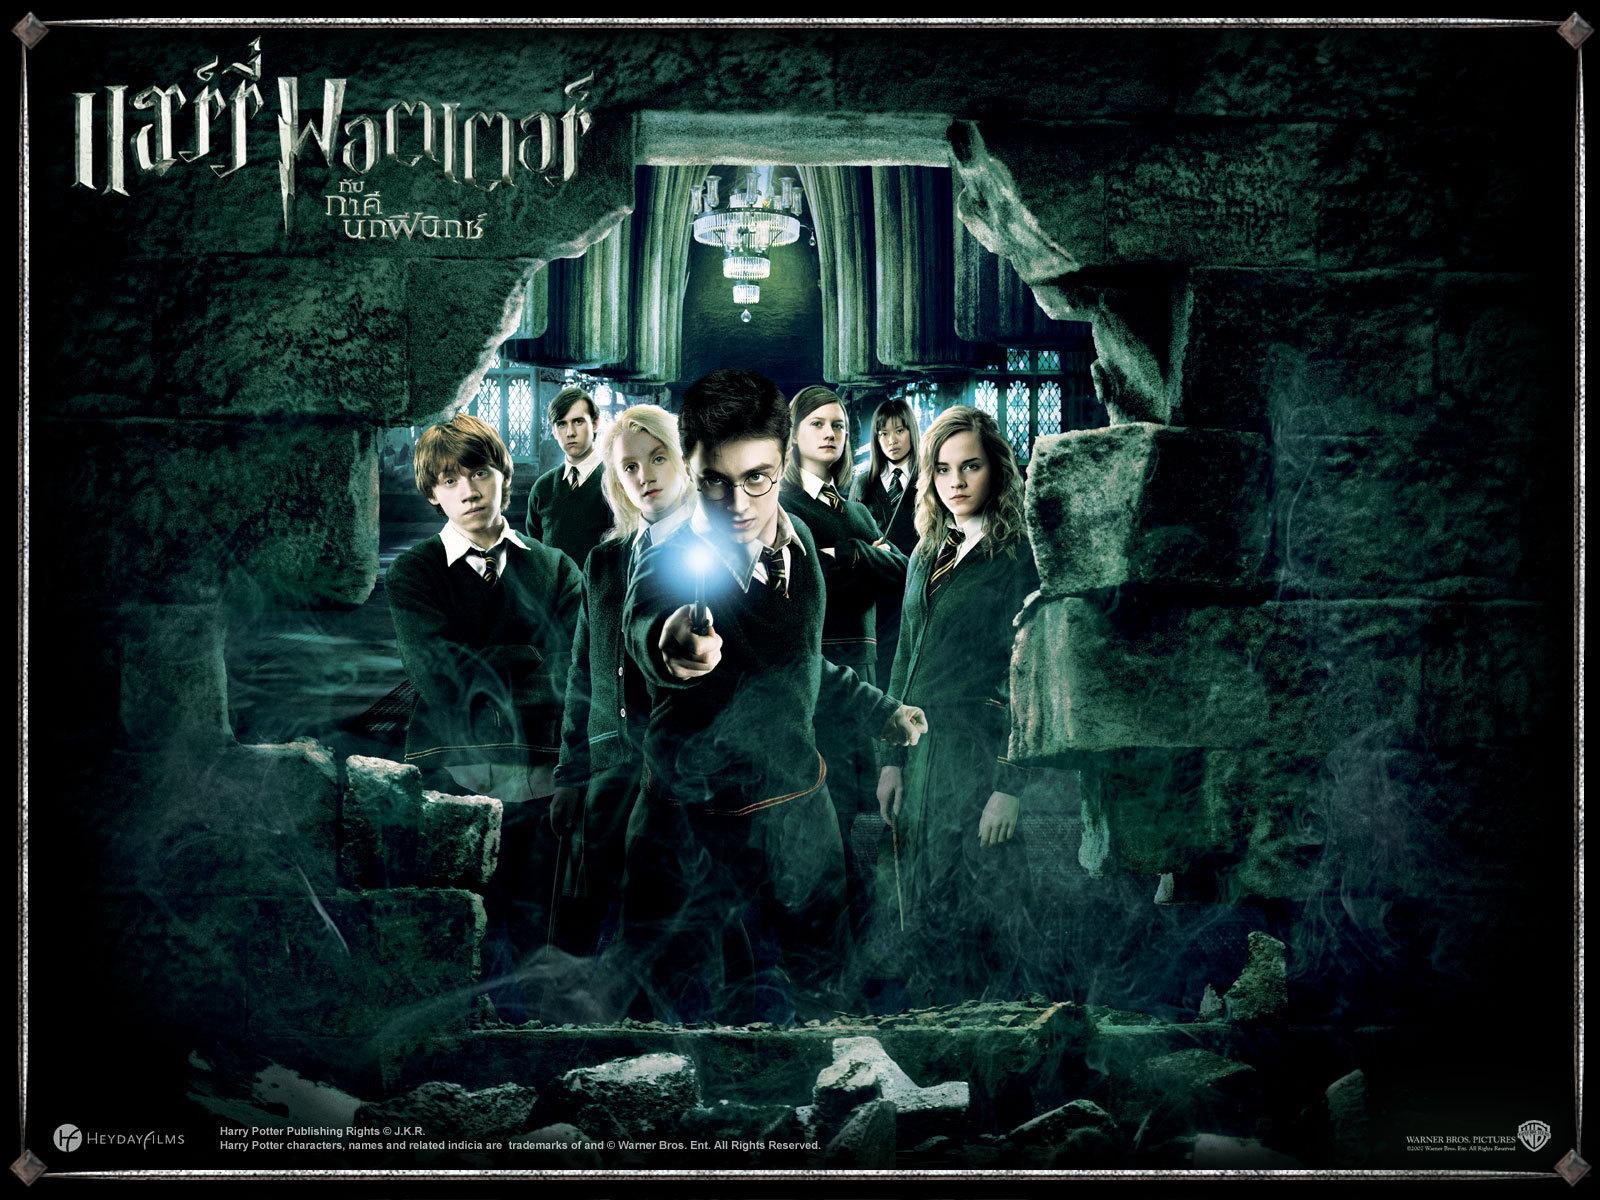 49 Harry Potter Wallpapers Free Download On Wallpapersafari